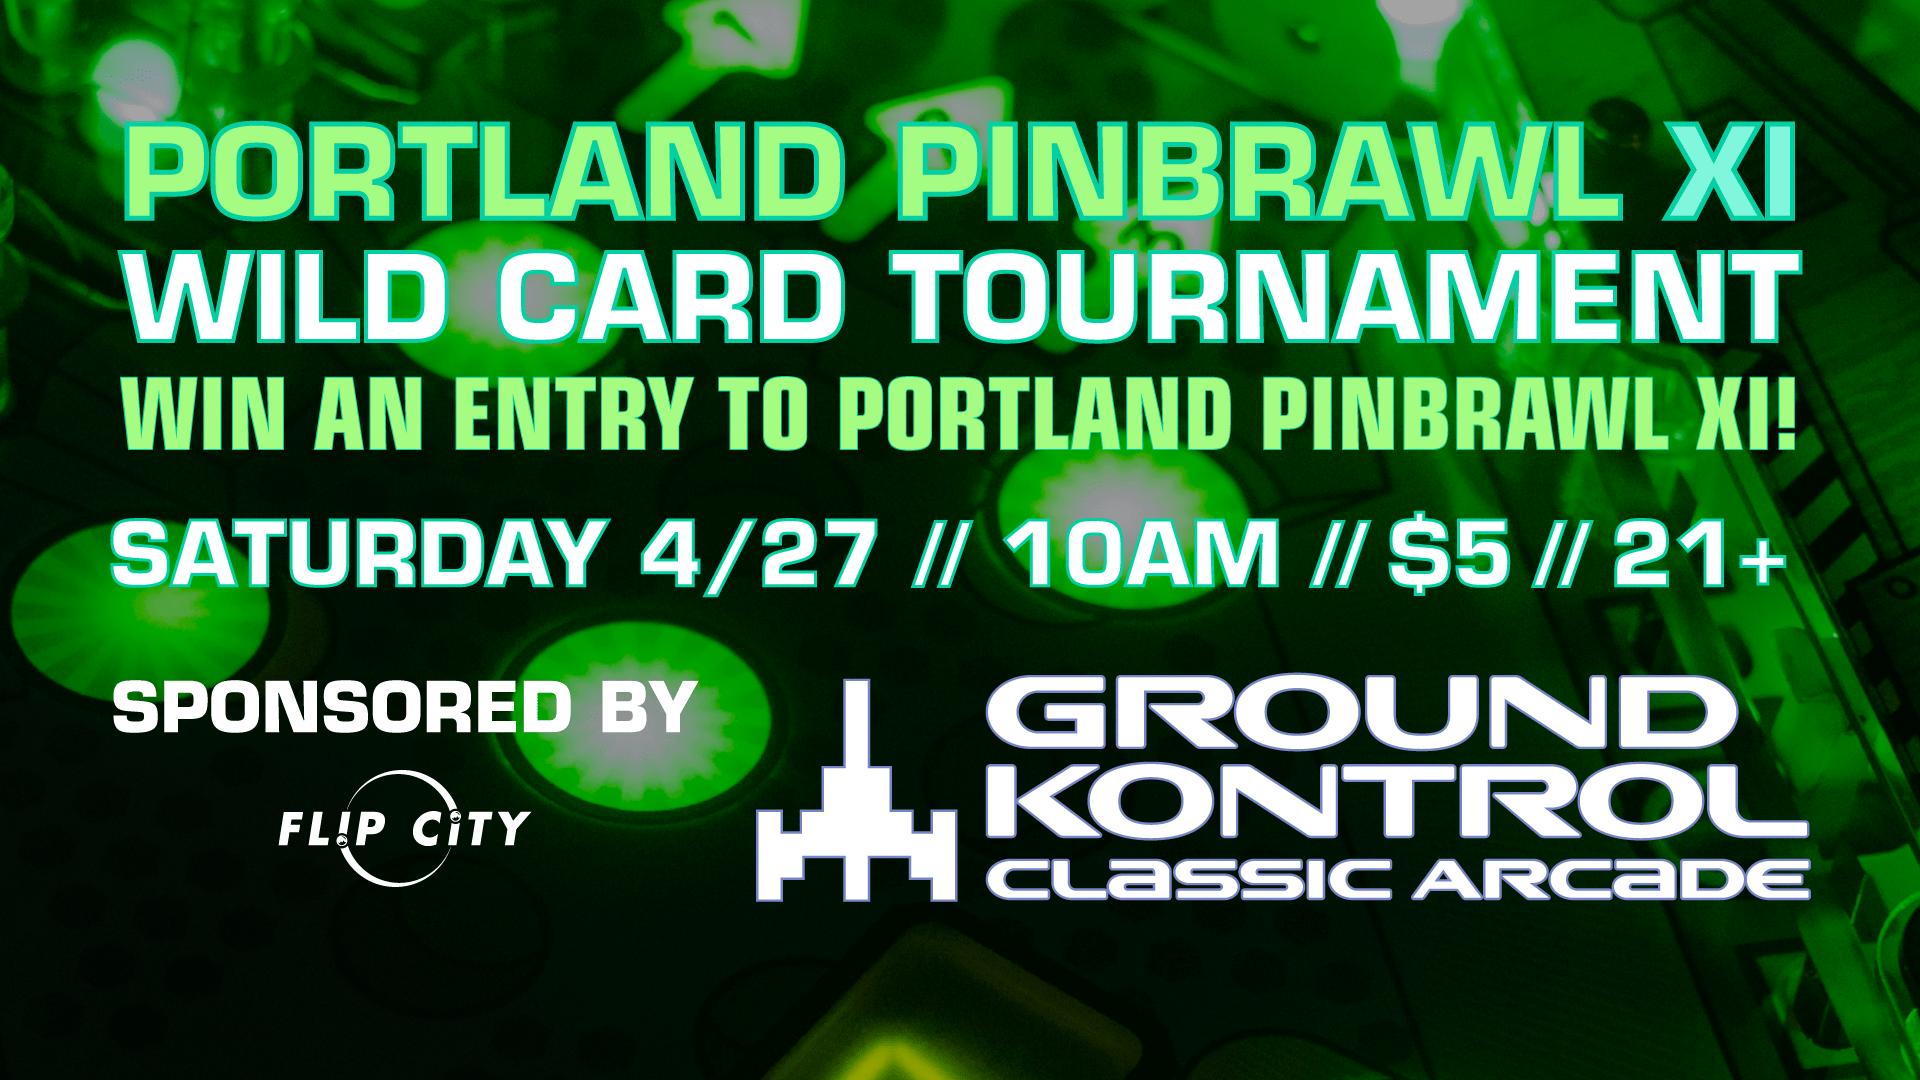 Portland Pinbrawl XI – Our 11th Annual Pinball Tournament – Sunday 4/28